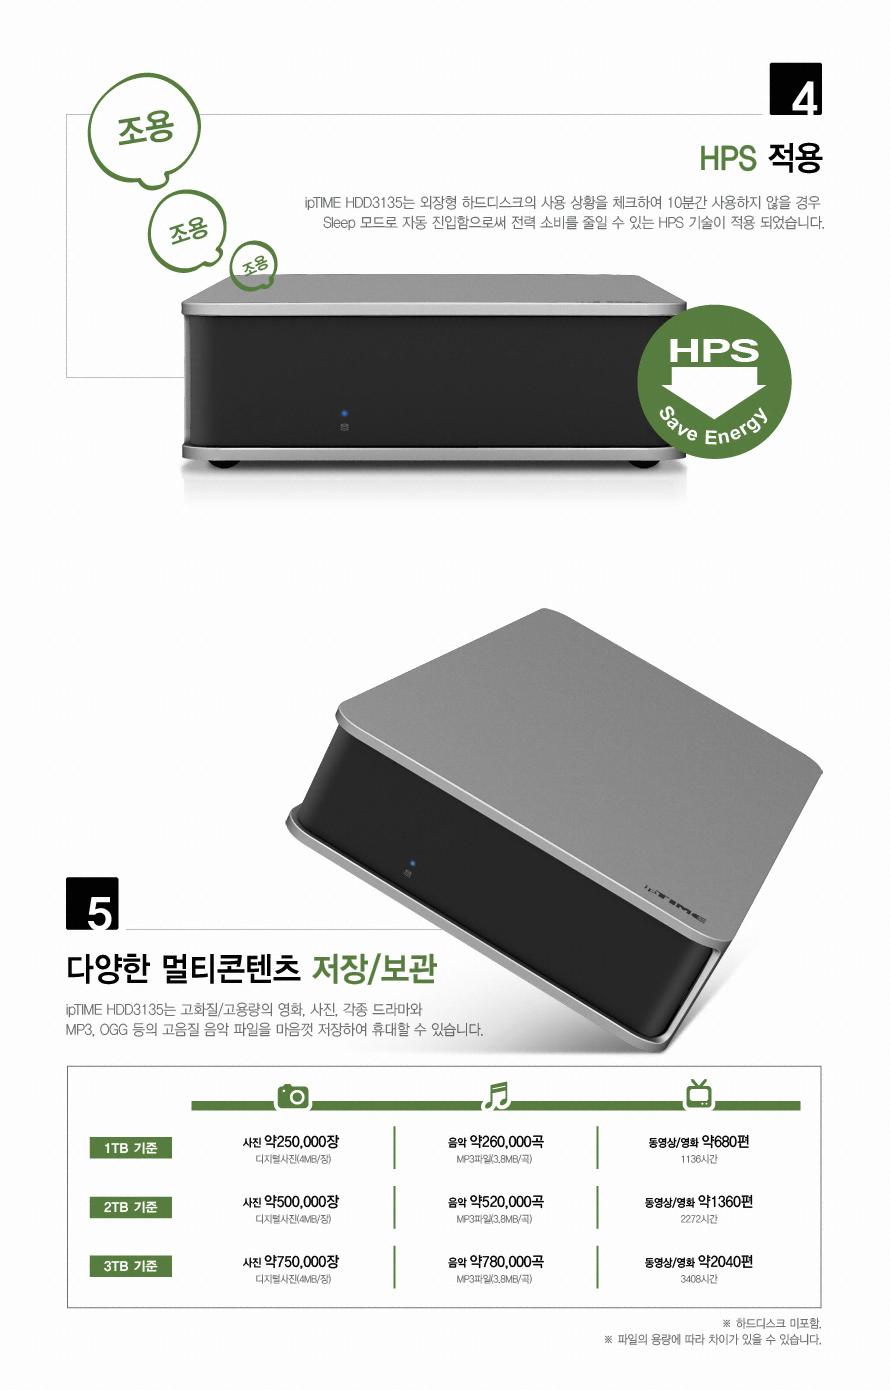 EFM ipTIME HDD 3135 USB 3.0 (500GB)